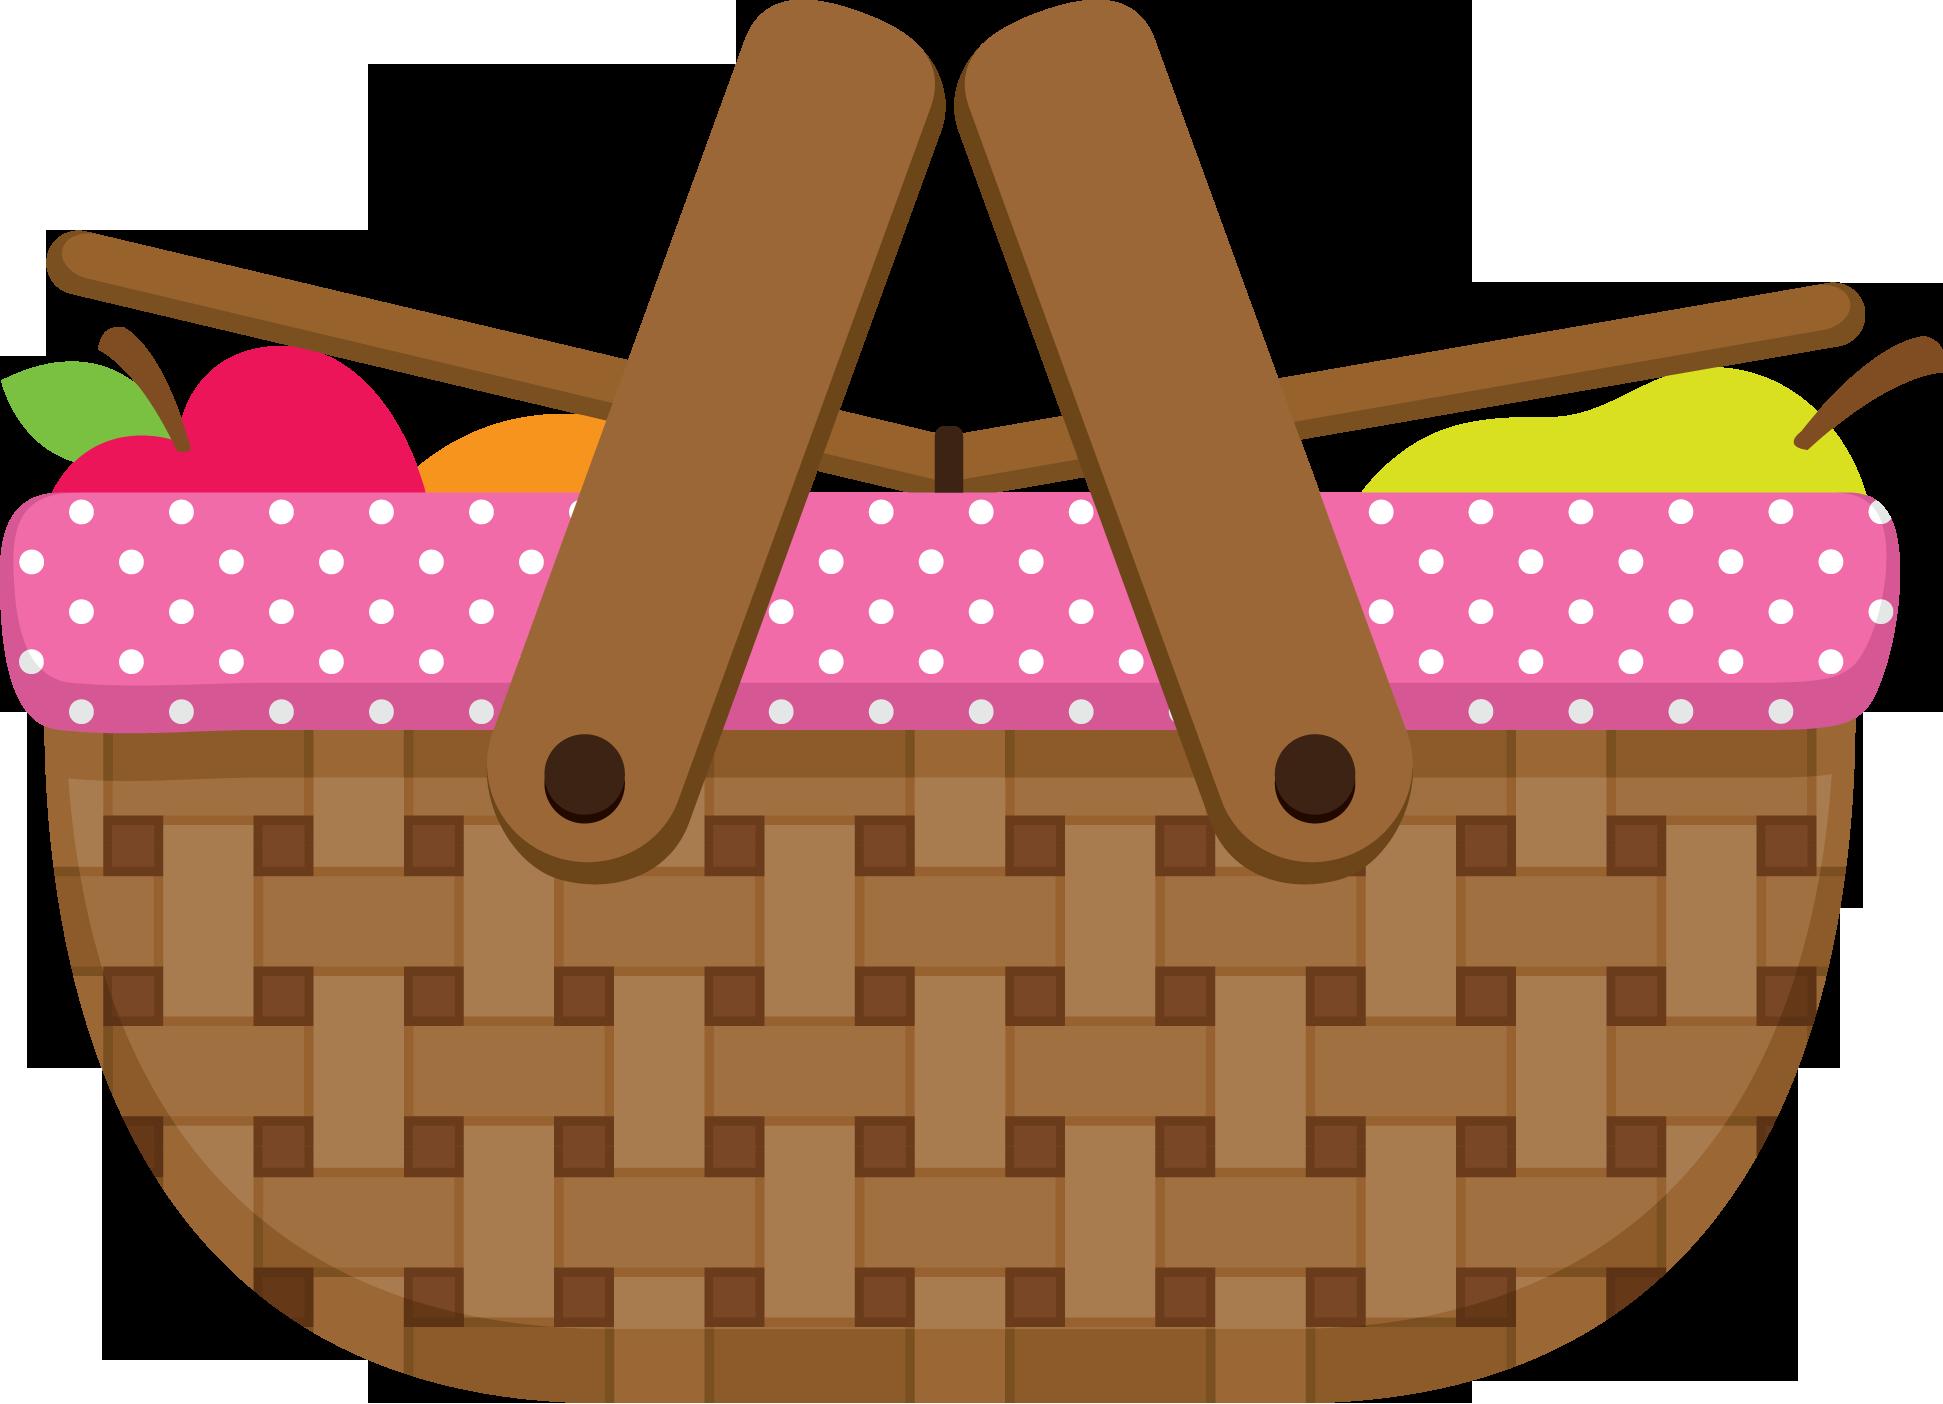 Lady clipart picnic. Ibcsveaojba nu png dibujos